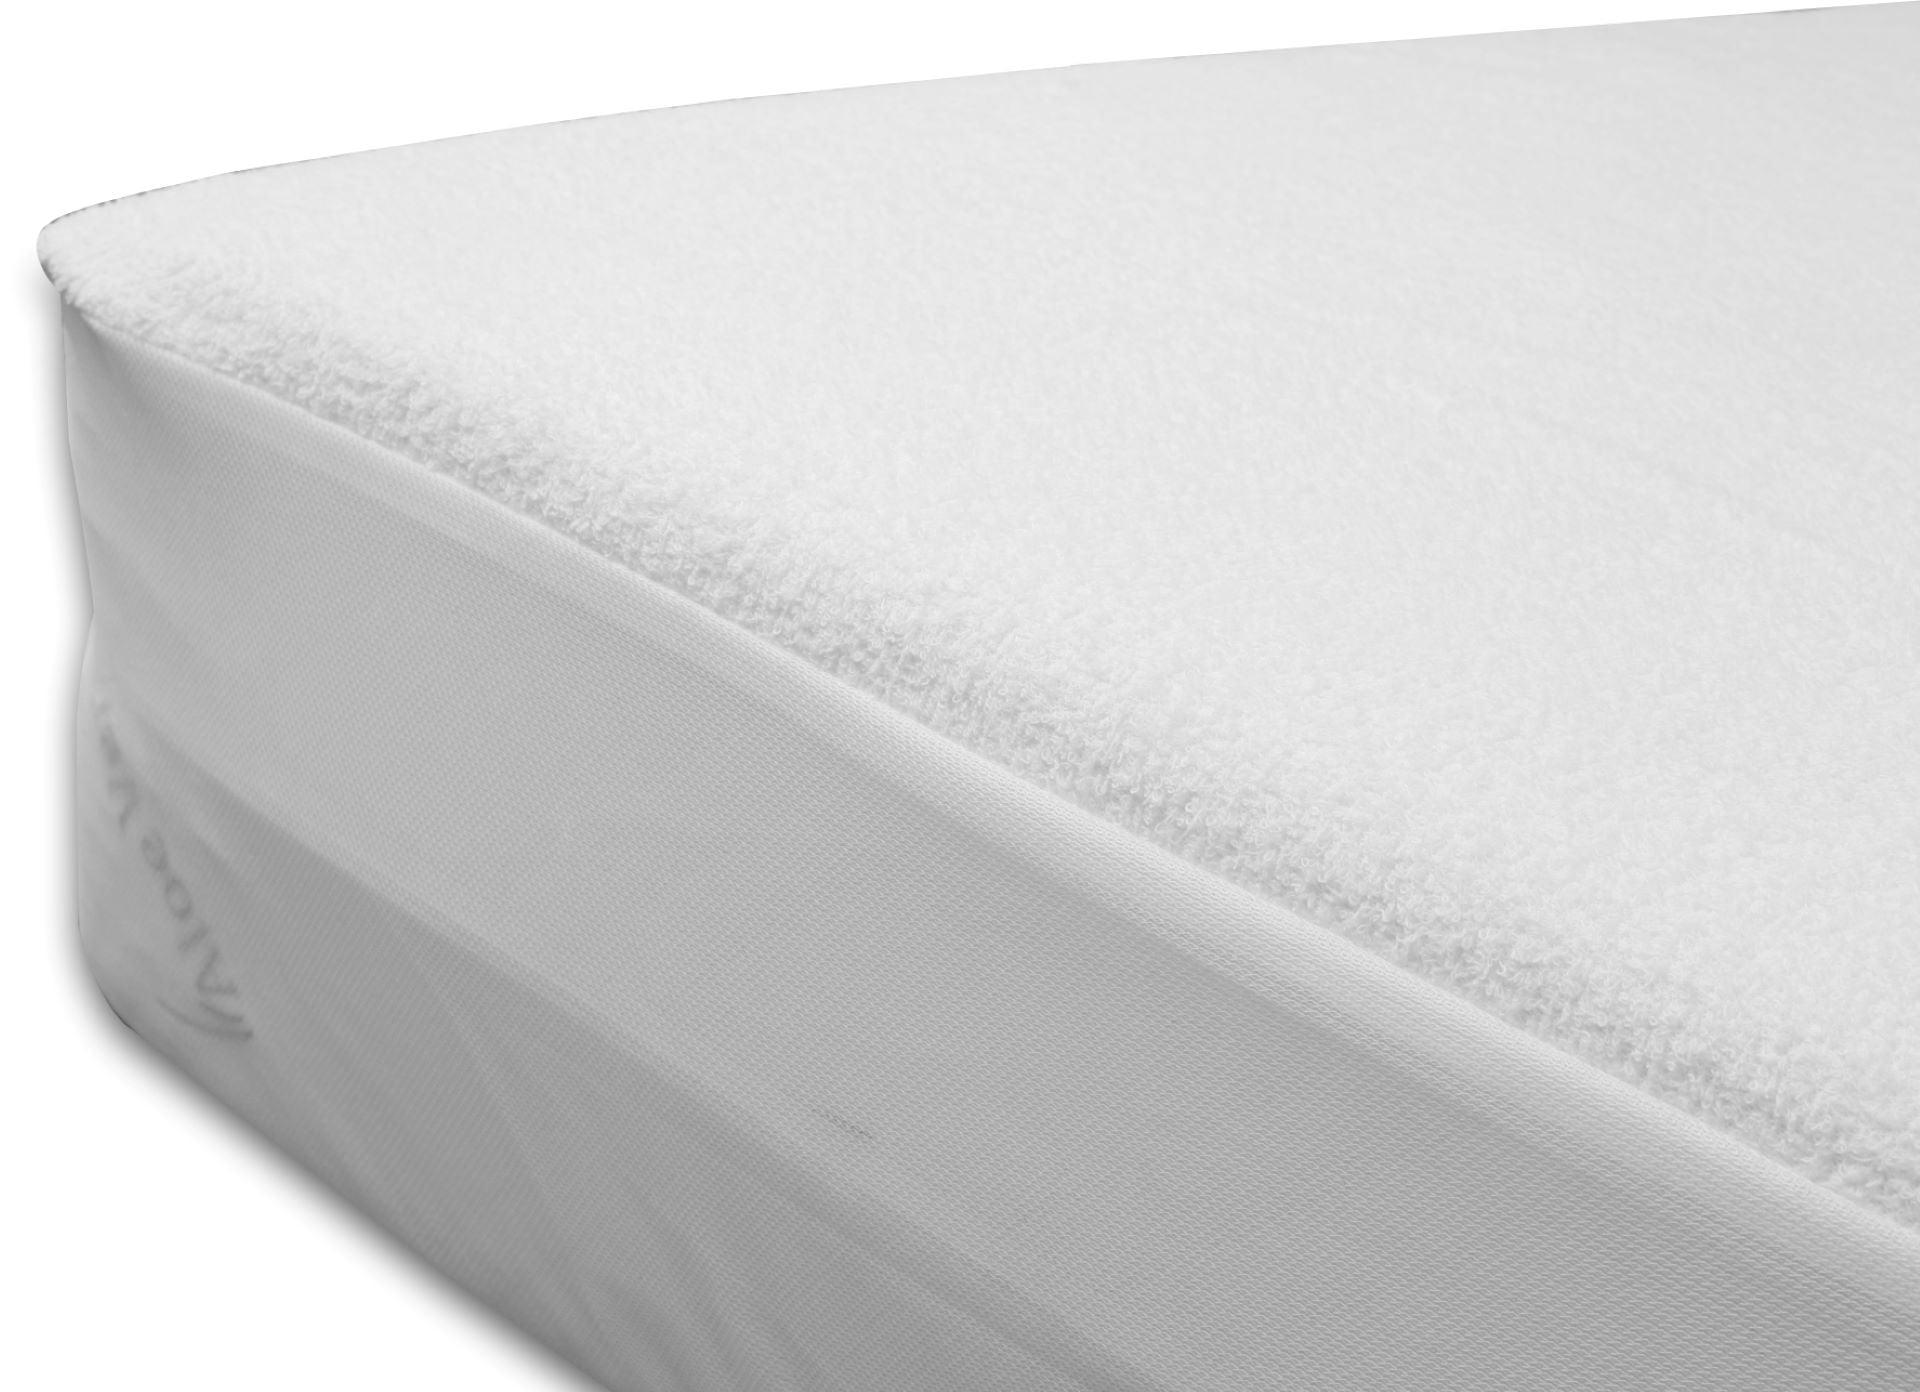 Protectie Somnart impermeabila bumbac pentru saltea - 180x200 cm